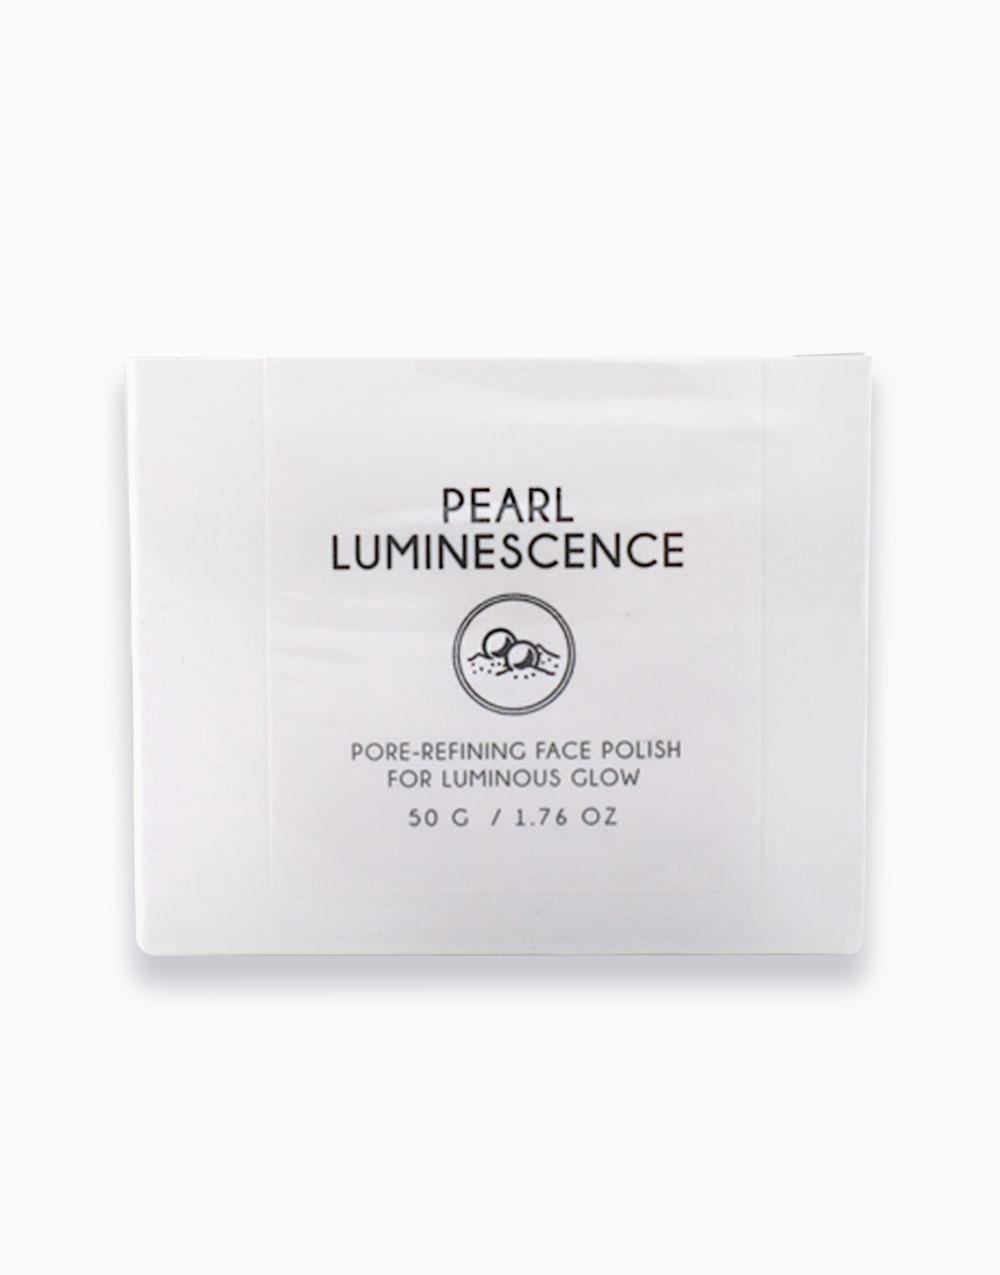 Pearl Luminescence Pore-Refining Face Polish by V&M Naturals